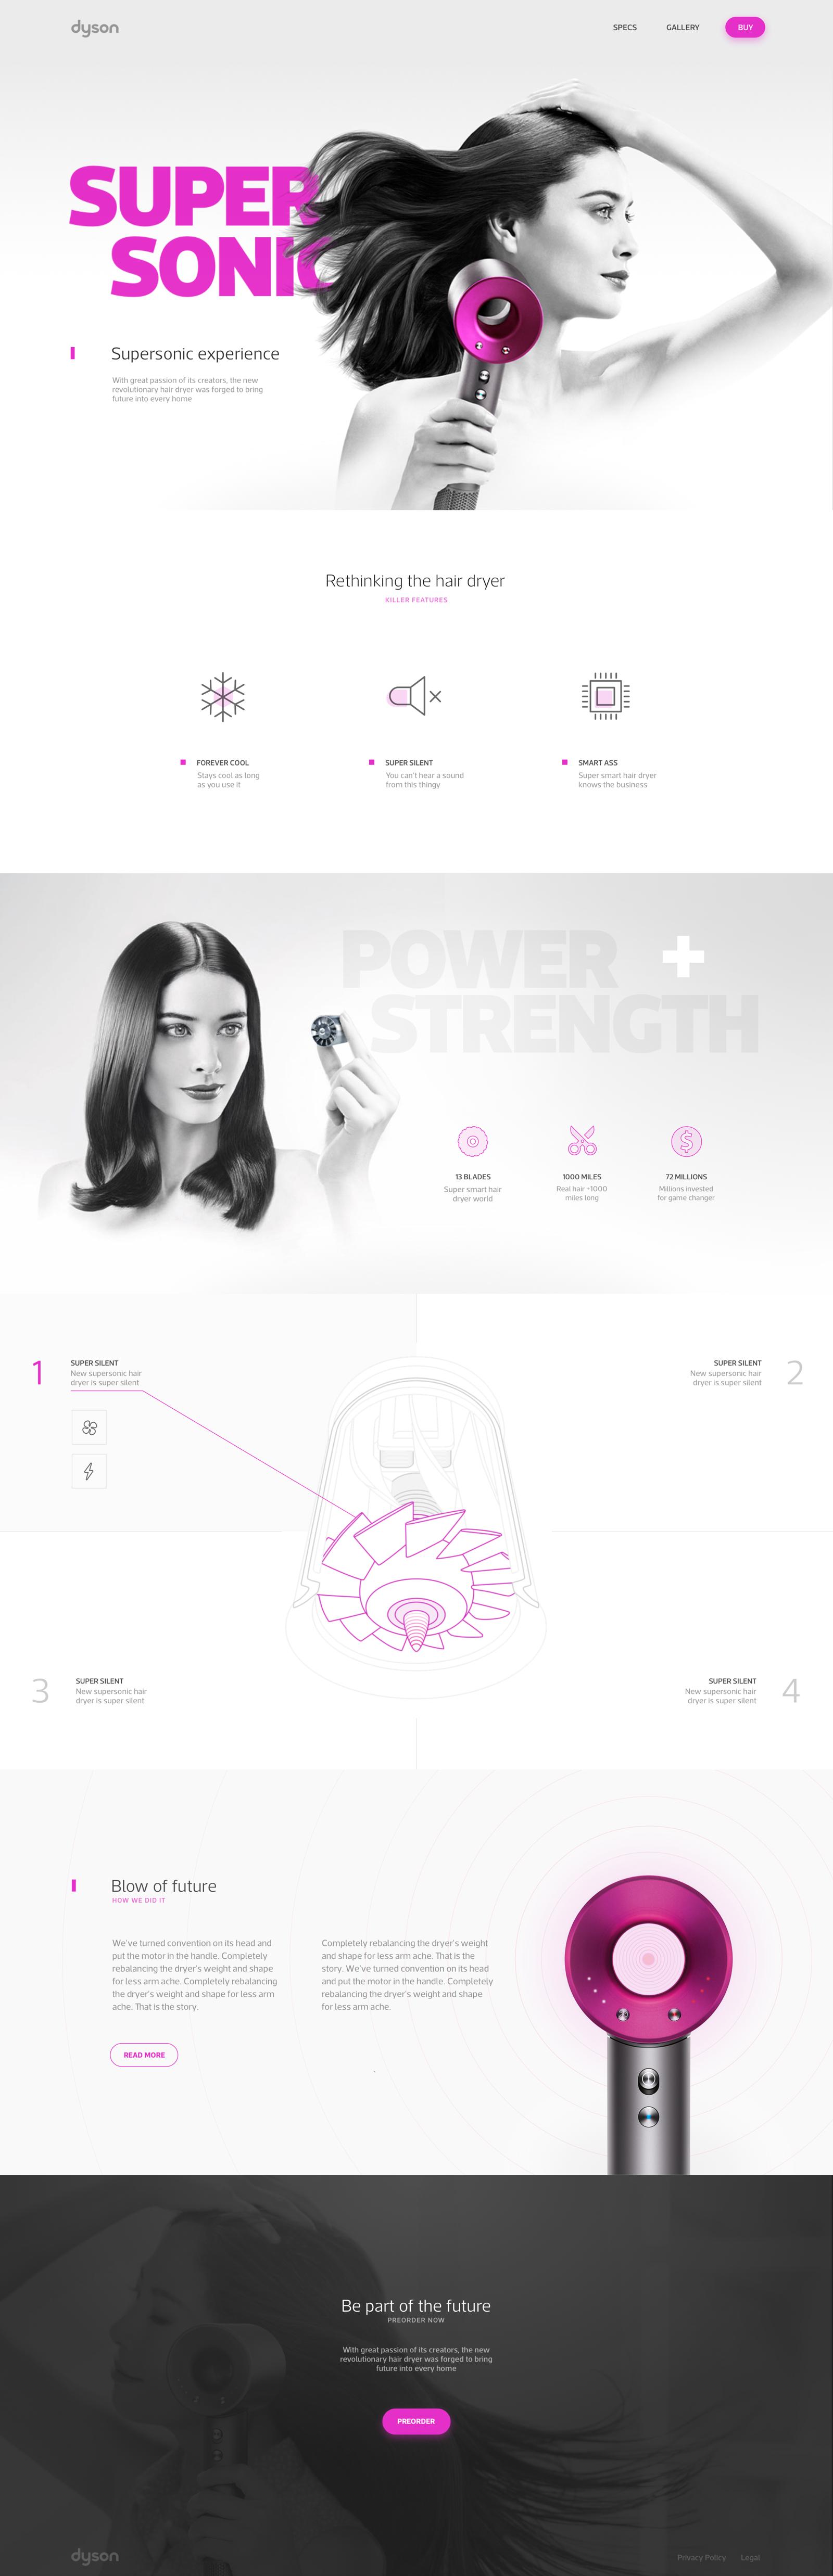 Dyson big sencillo pinterest website designs website and